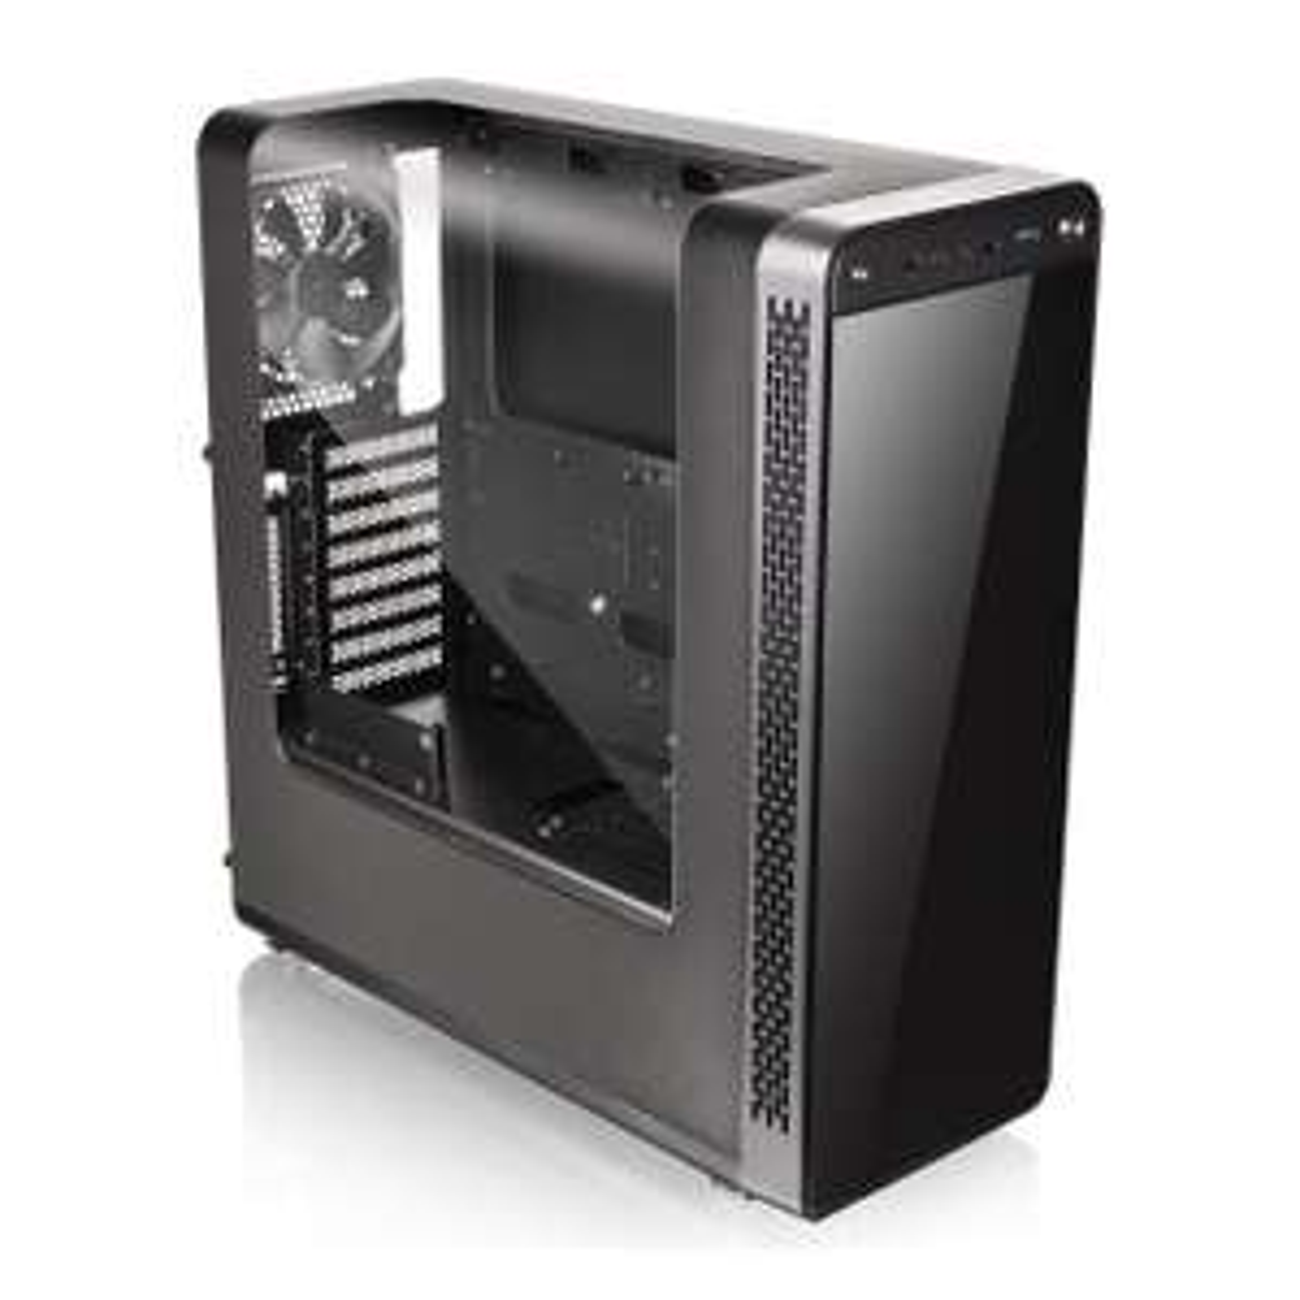 View 27 Thermaltake Gull Wing Windowed PC Gaming Midi Case £44.48 @ Scan